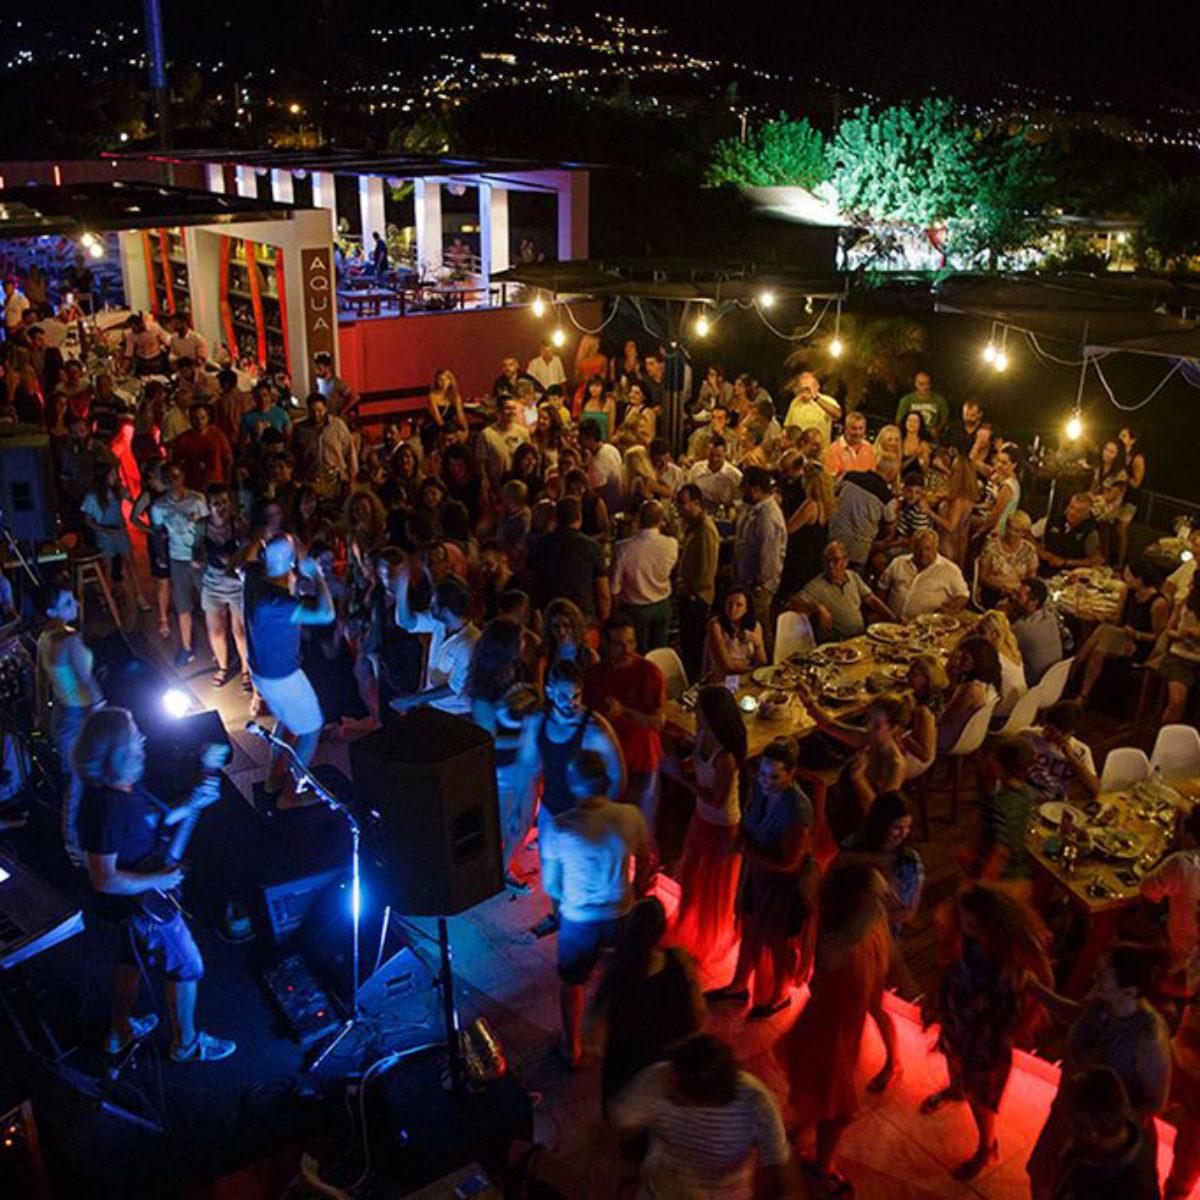 Yiamas Gastro Bar - Καλαμάτα - Μοντέρνα Ευρωπαϊκή Κουζίνα - Μουσικές βραδιές - Live events 5